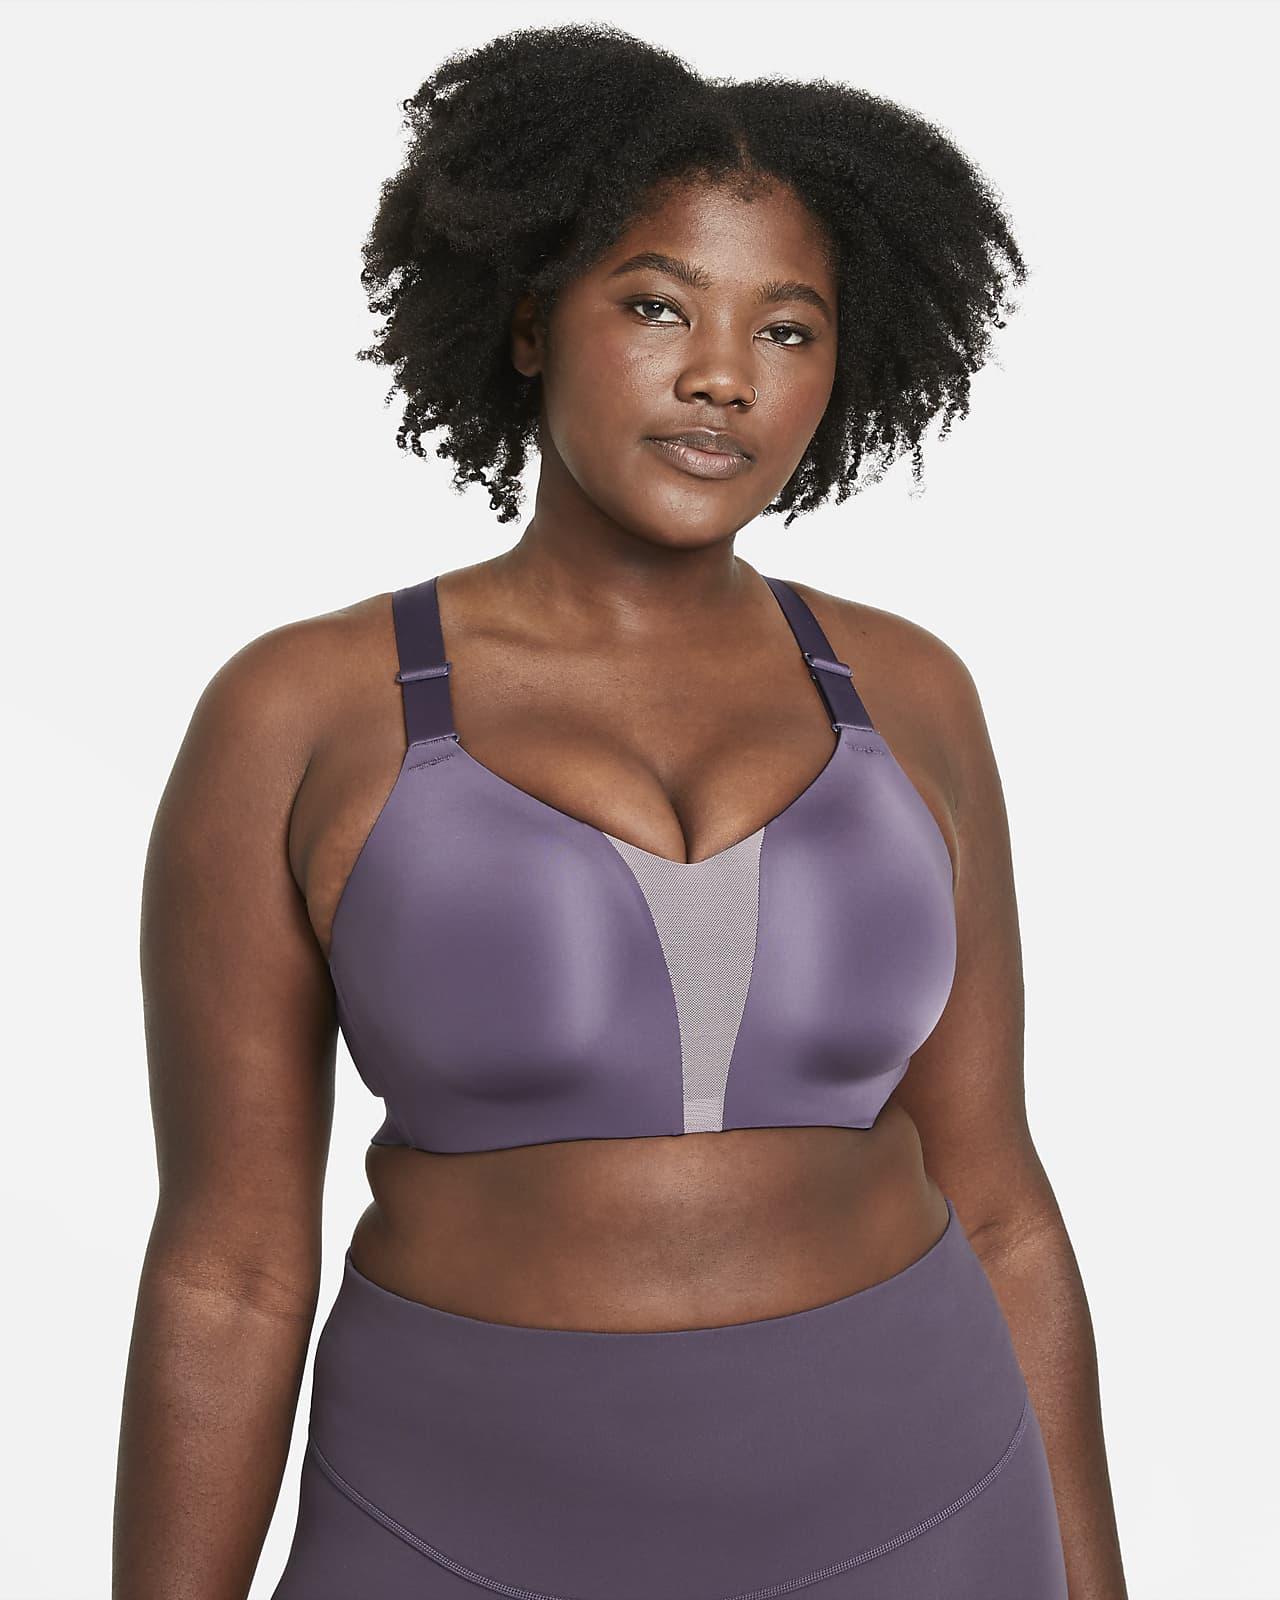 Nike Dri-FIT Rival Women's High-Support Underwire Sports Bra (Plus Size)